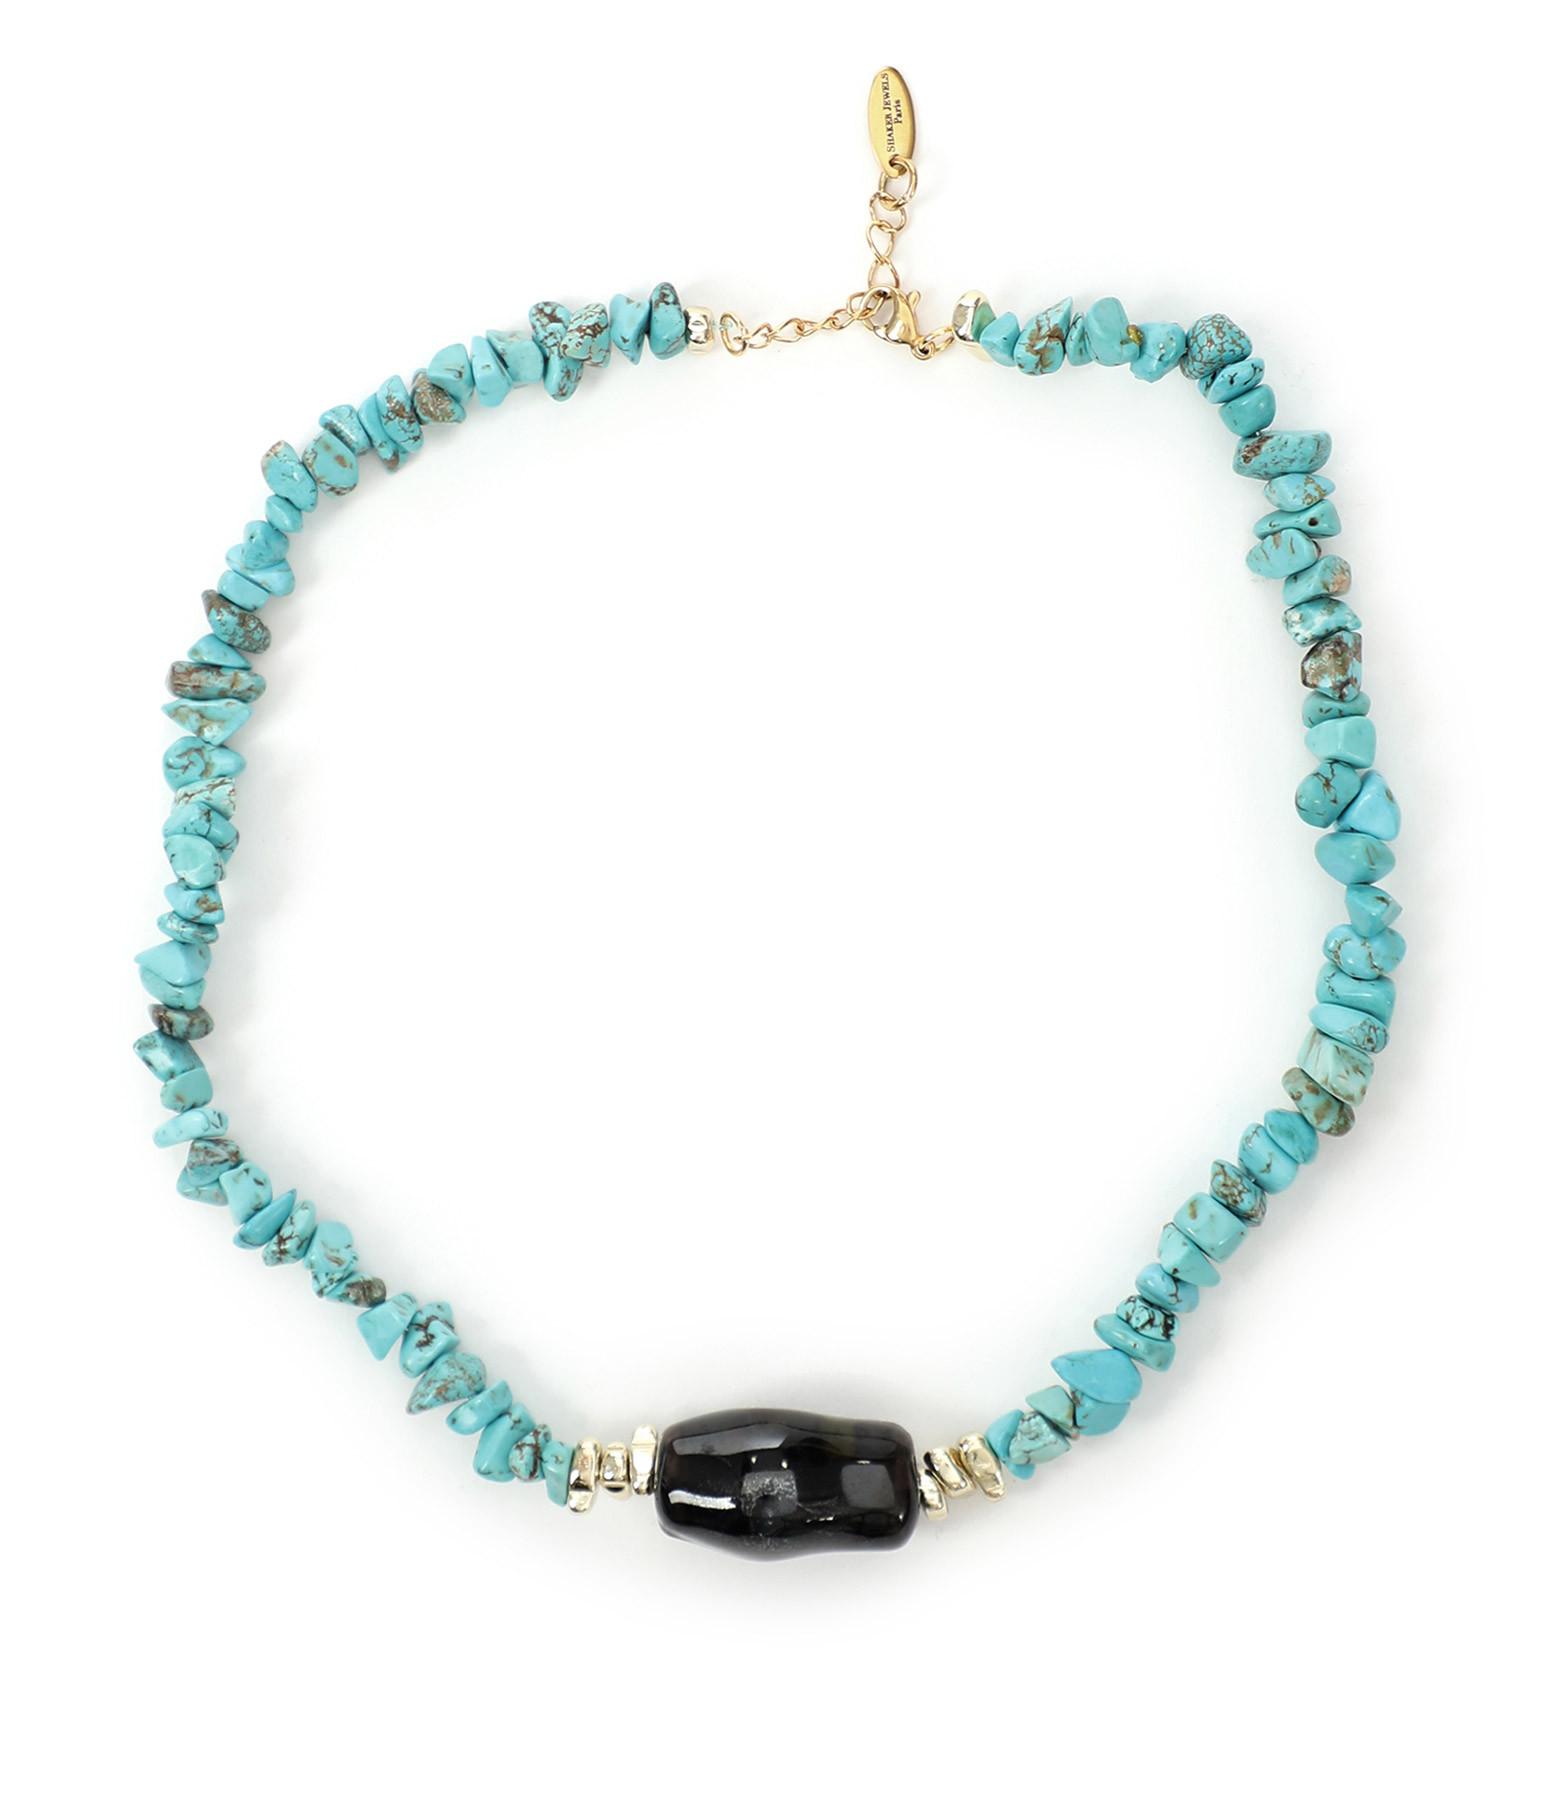 SHAKER JEWELS - Collier Urika Turquoise Perles Pierre Noir